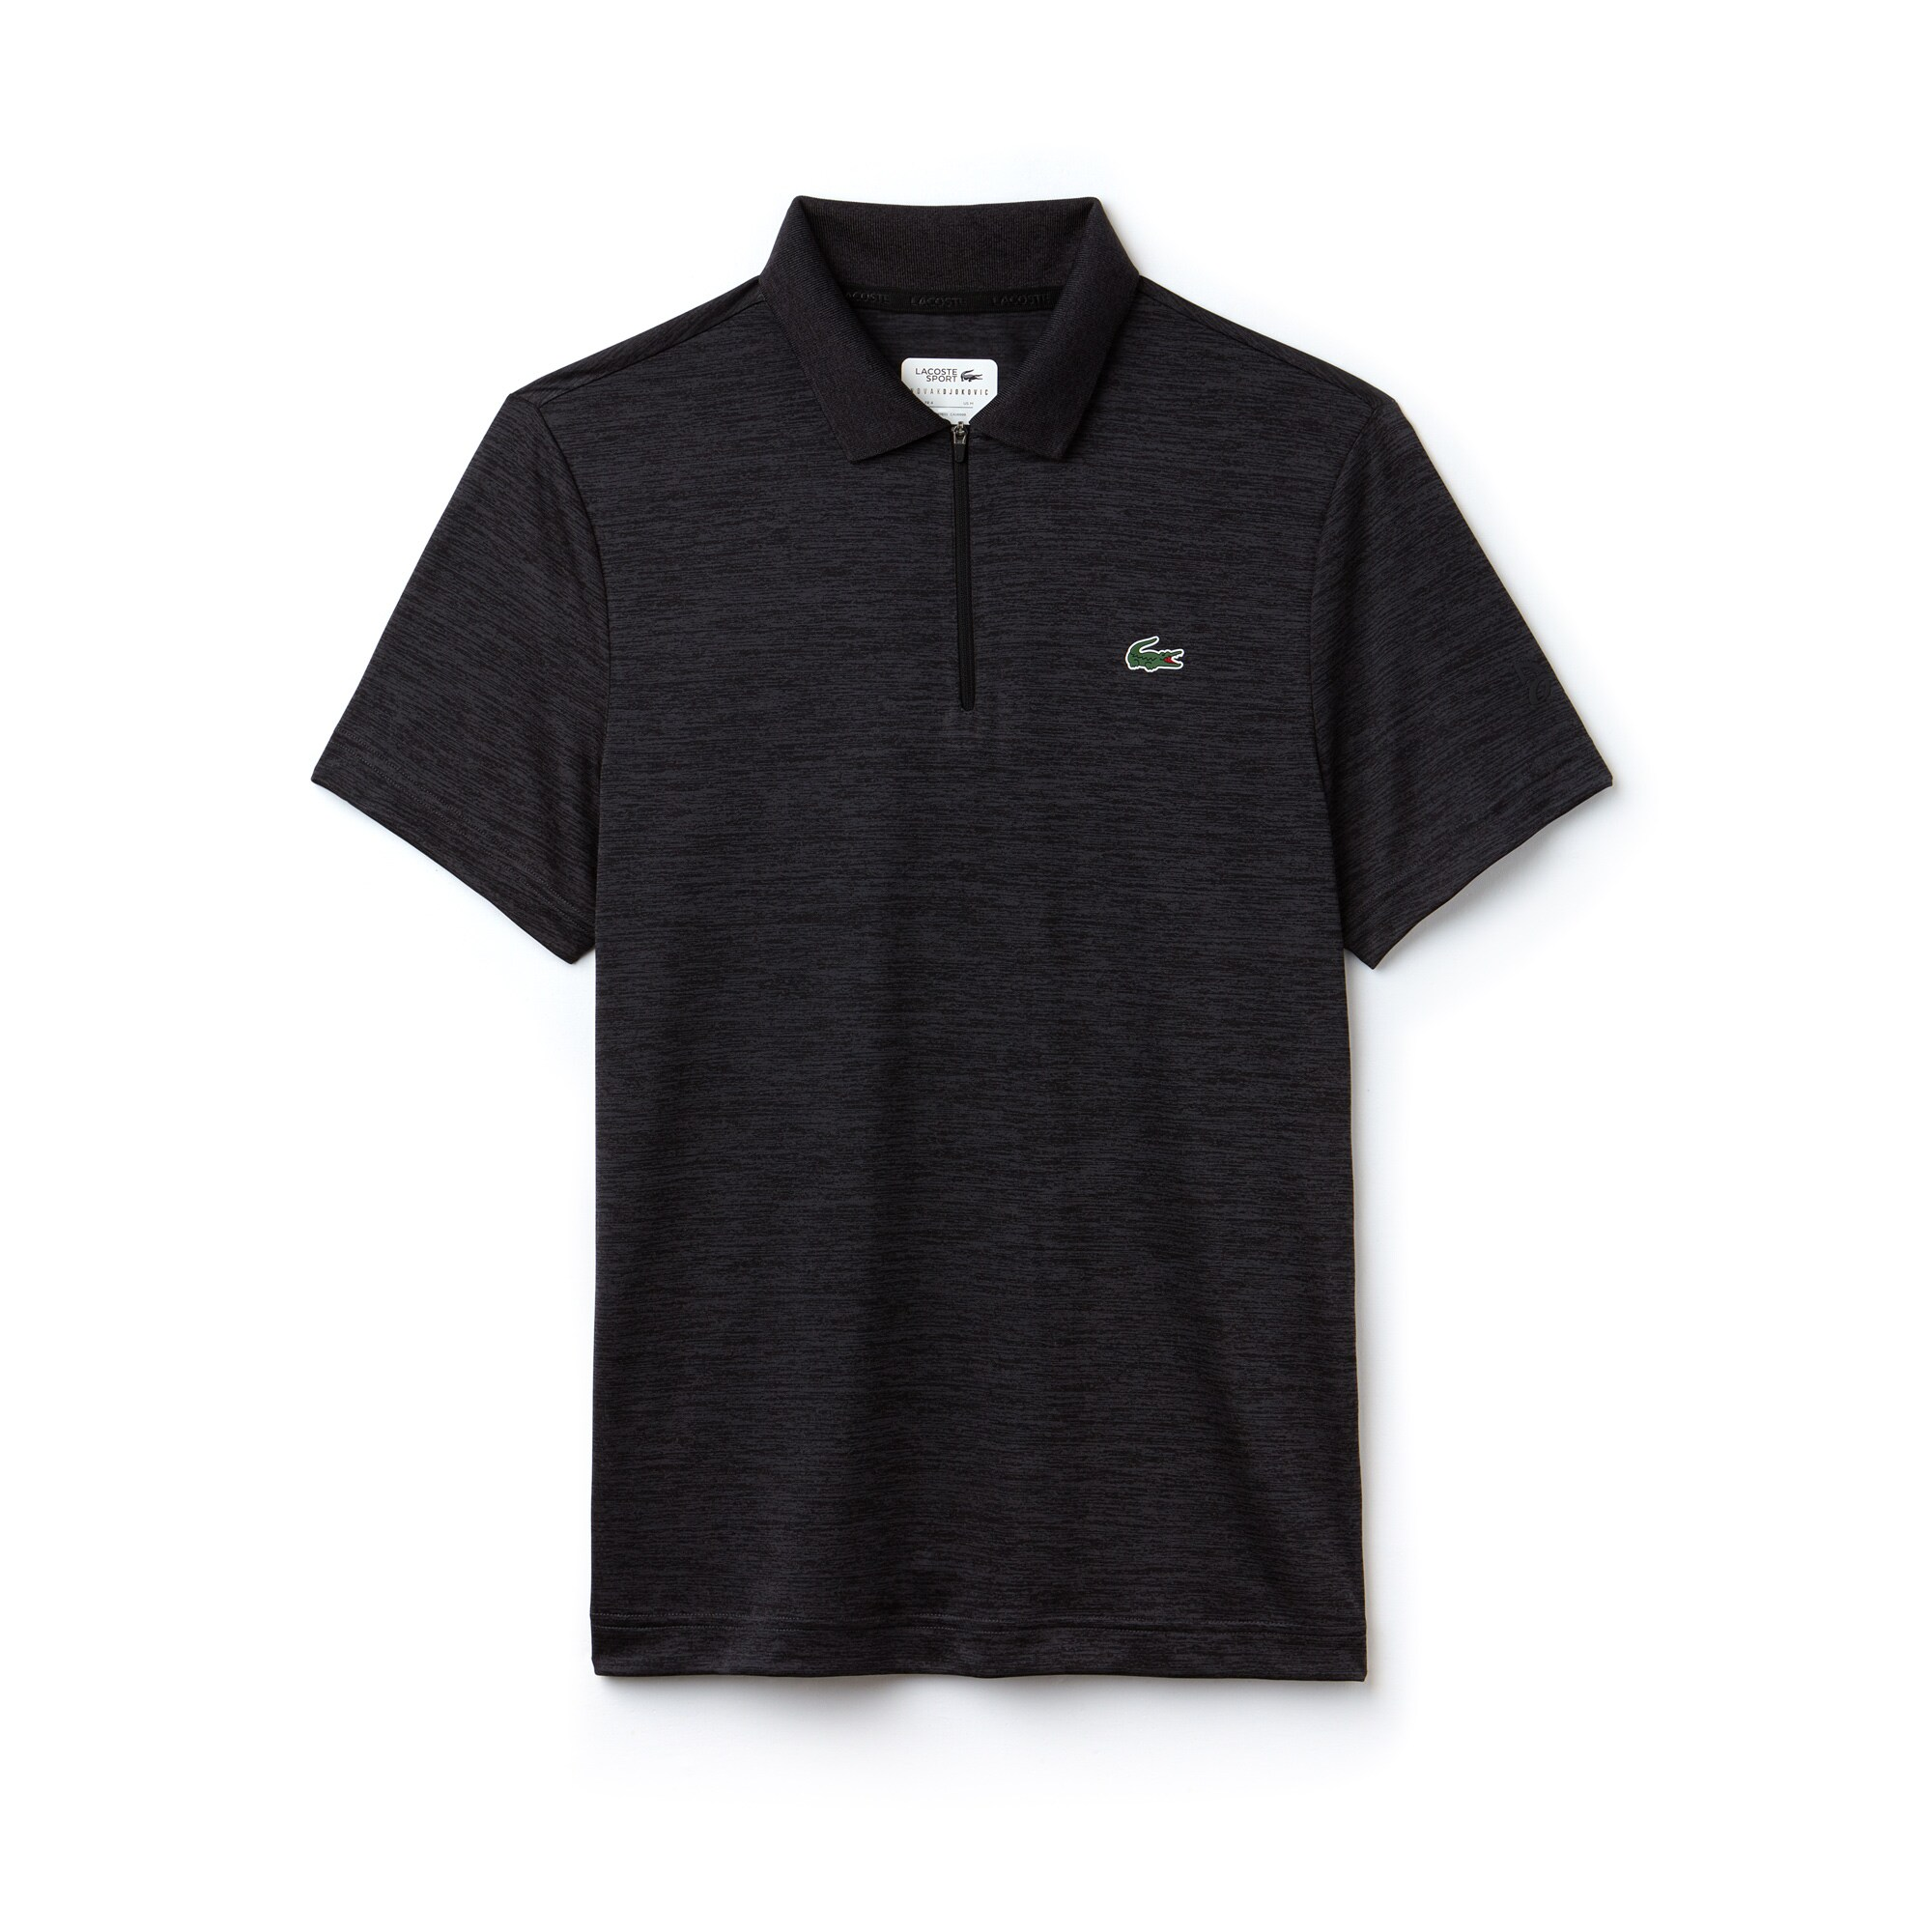 Herren-Poloshirt aus meliertem Jersey LACOSTE SPORT